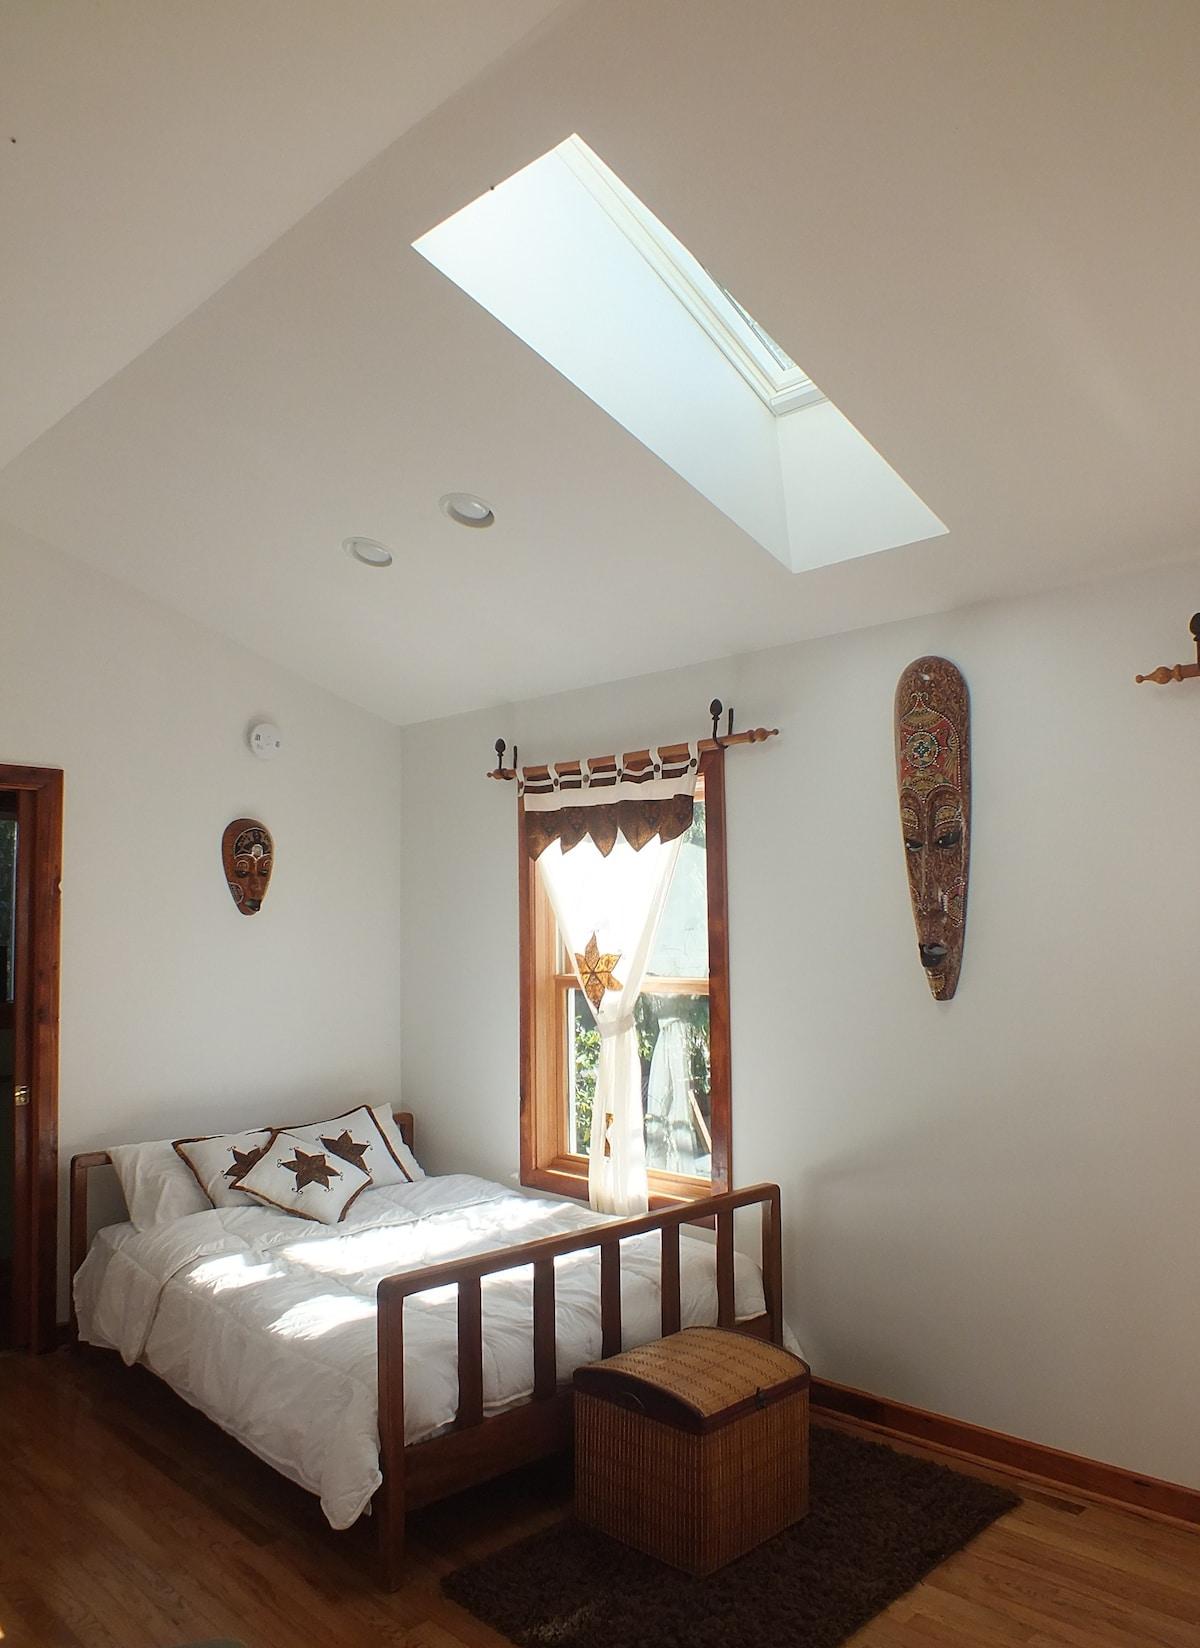 Private Loft ideal location